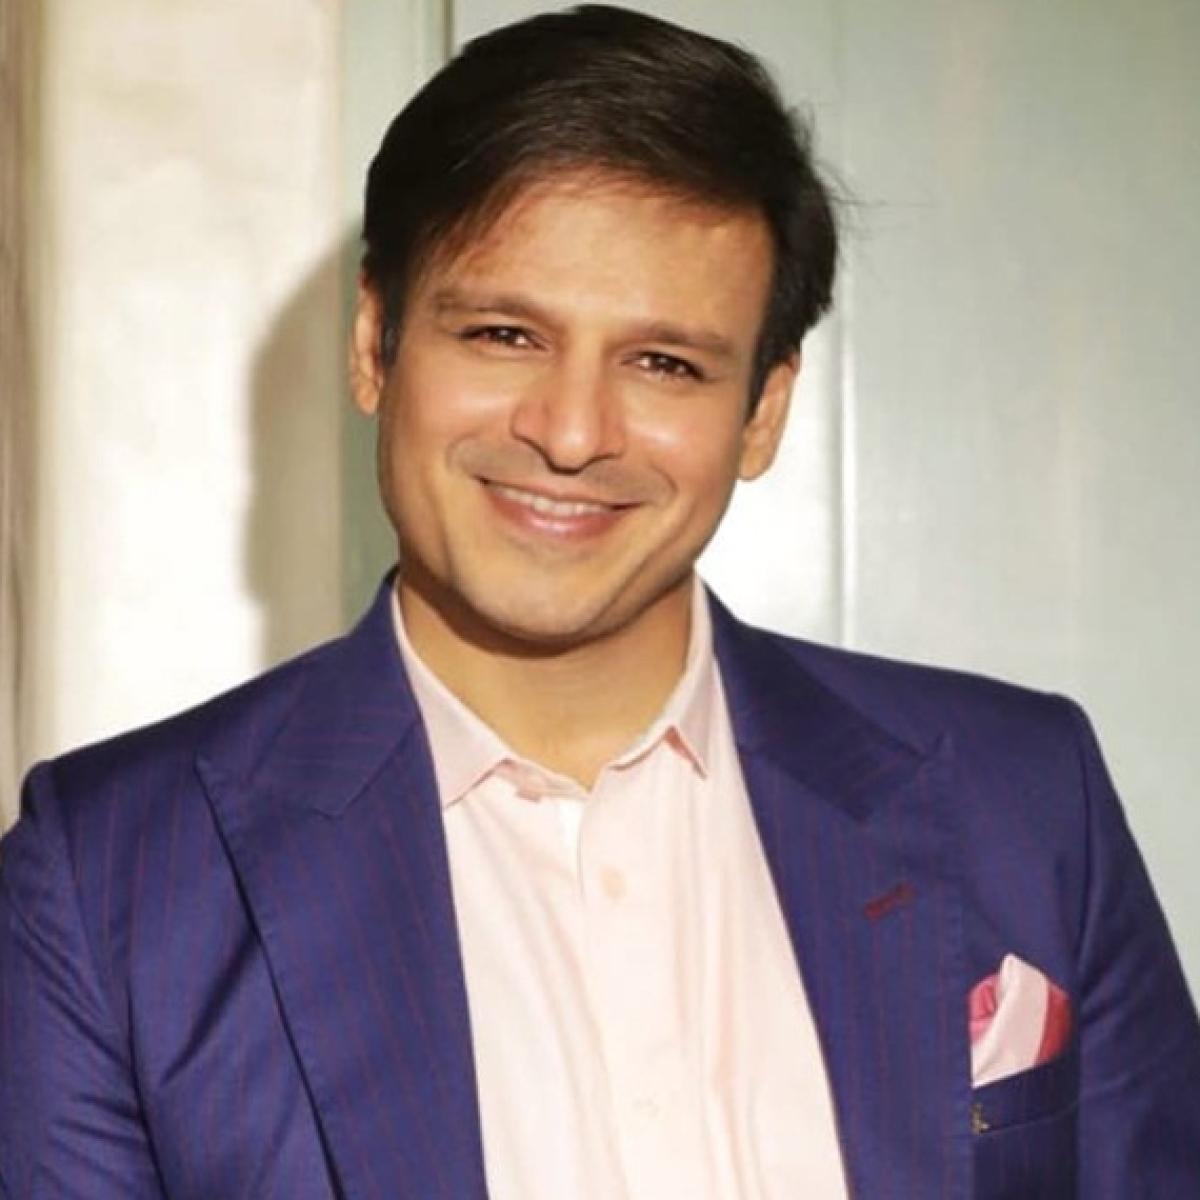 Vivek Oberoi to bankroll Vishal Mishra's upcoming whodunit thriller